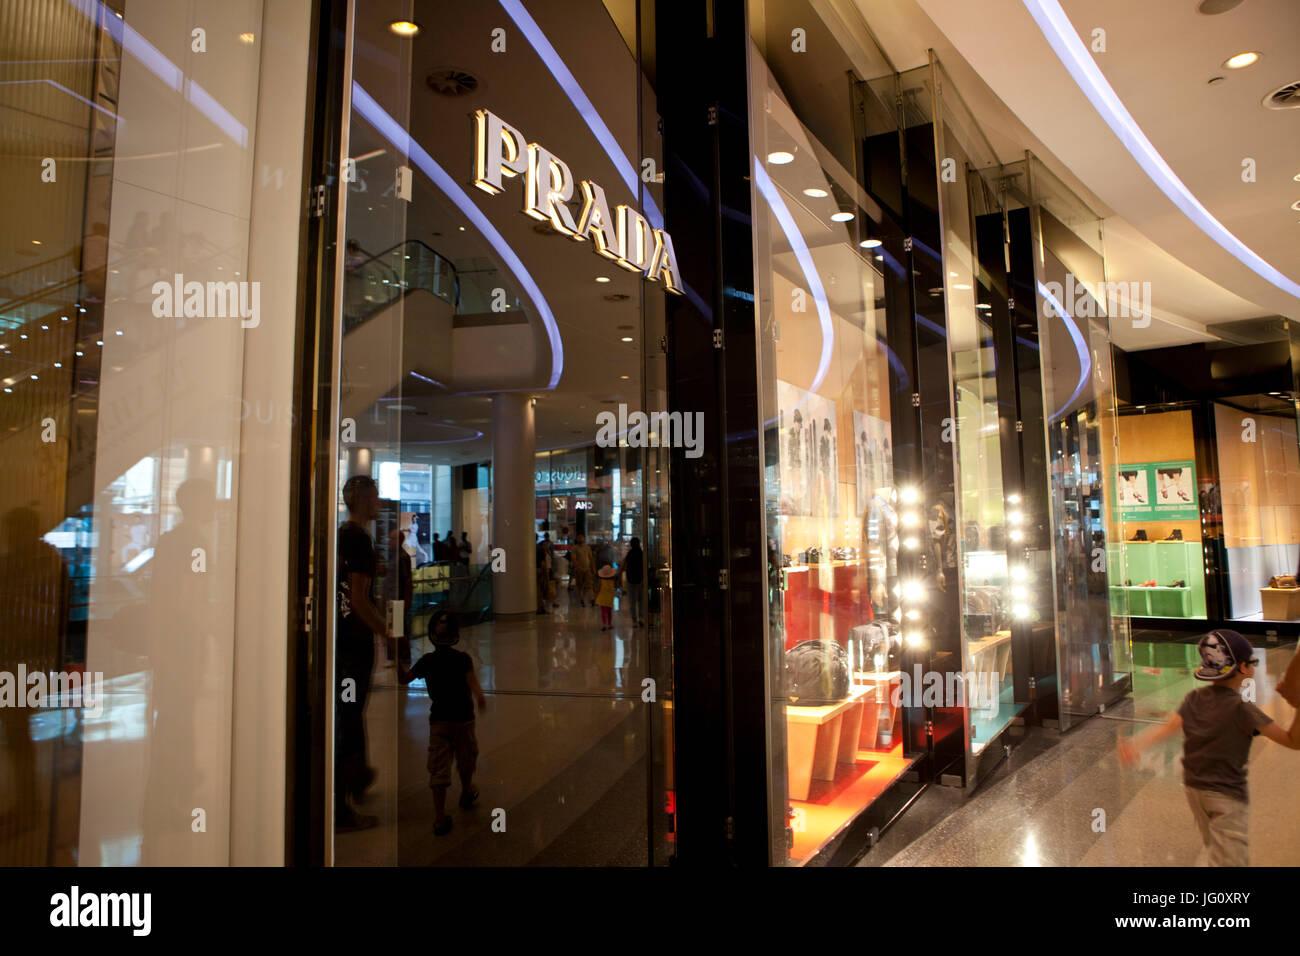 Shops in Westfield London, England - Stock Image